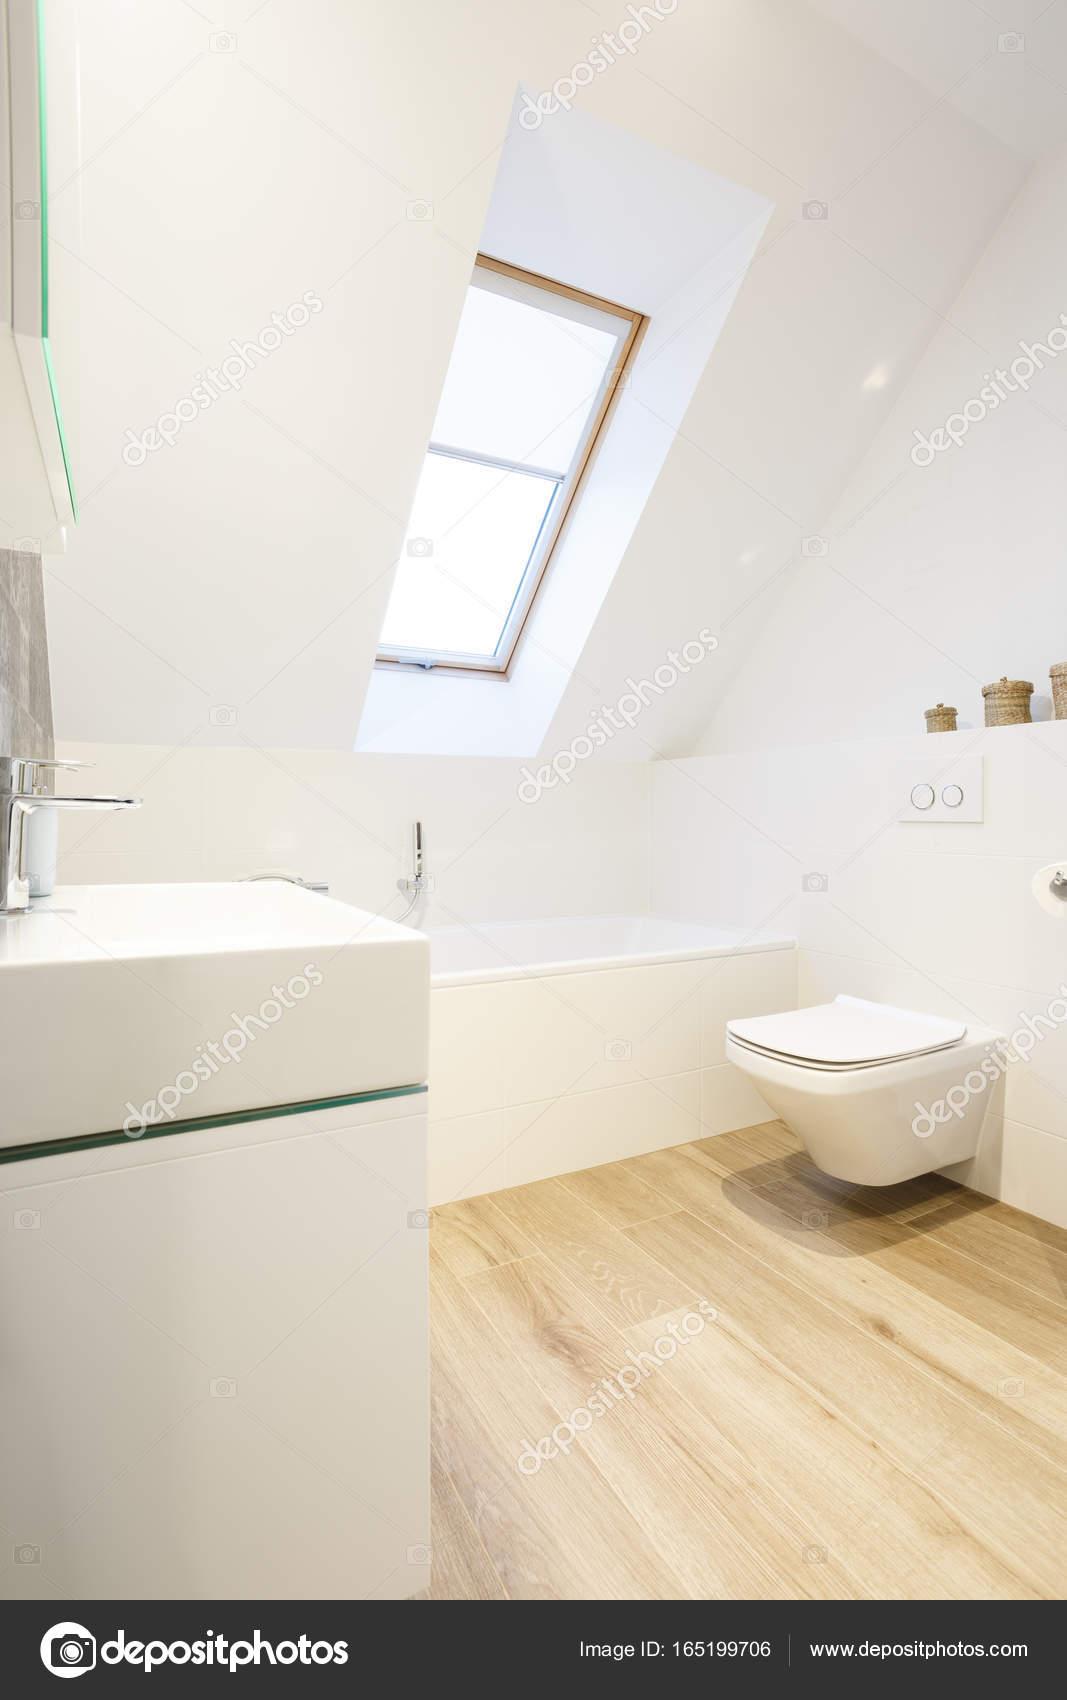 https://st3.depositphotos.com/2249091/16519/i/1600/depositphotos_165199706-stockafbeelding-witte-badkamer-met-houten-vloer.jpg